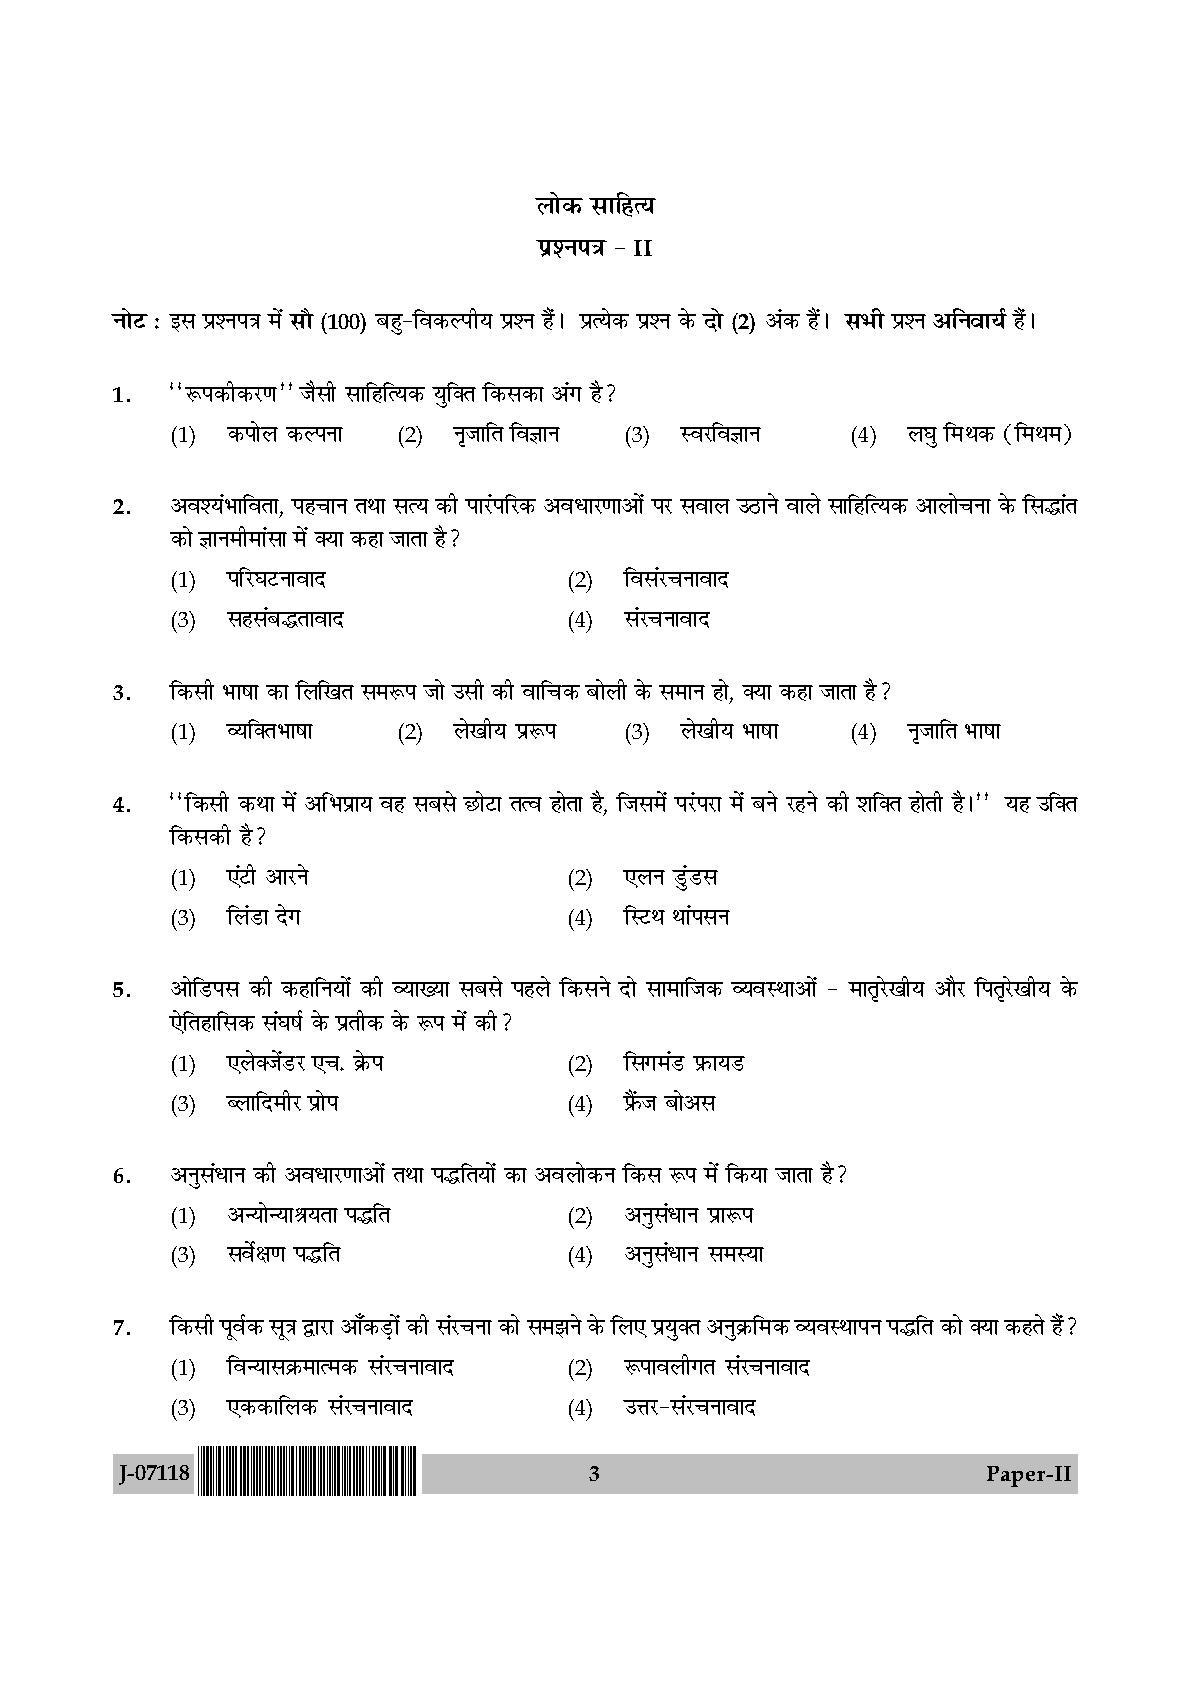 Folk Literature Question Paper II July 2018 in Hindi-UGC NET